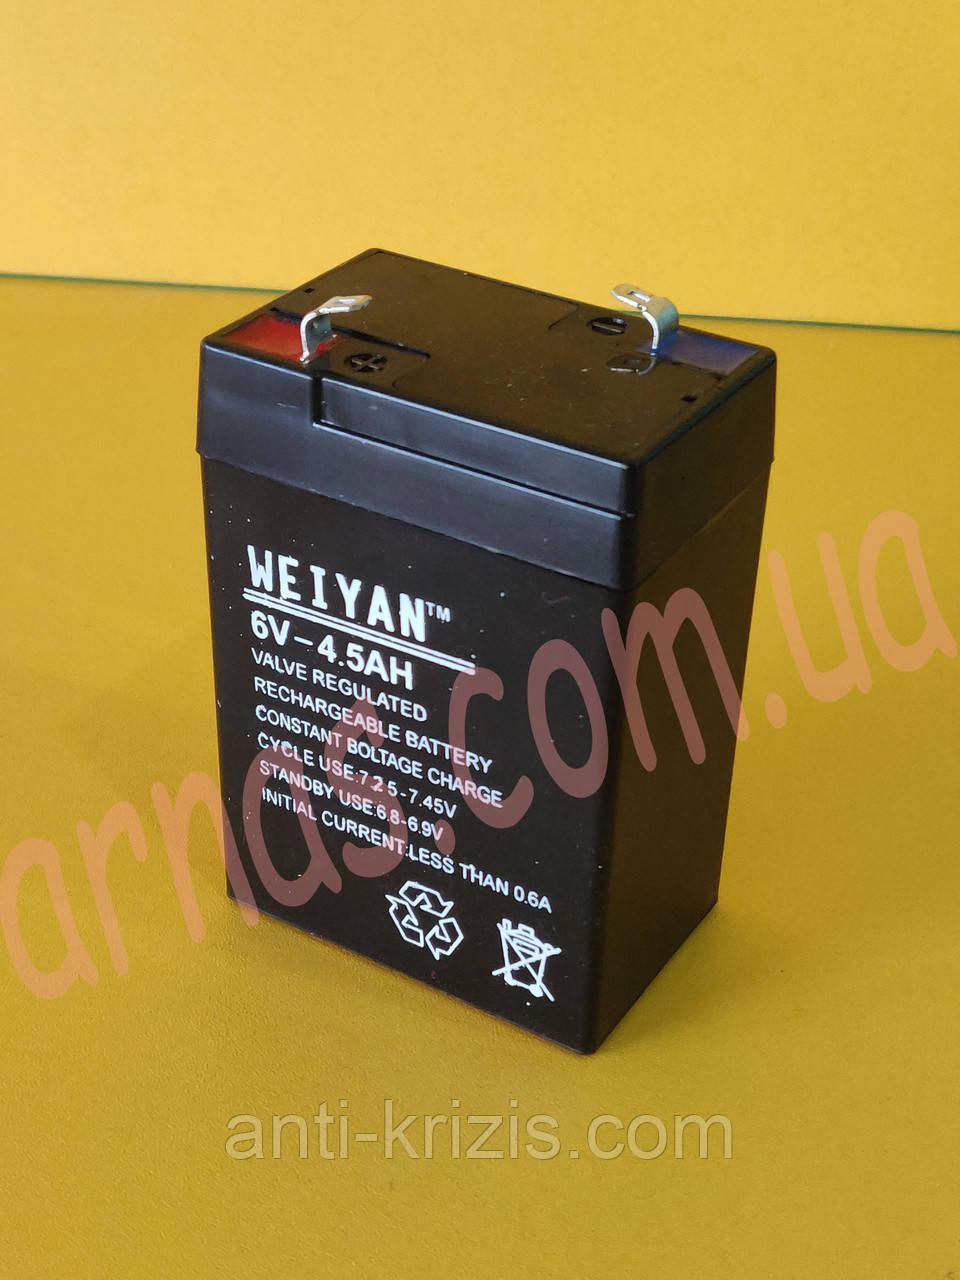 Аккумулятор 6v 4,5ah 500 грамм